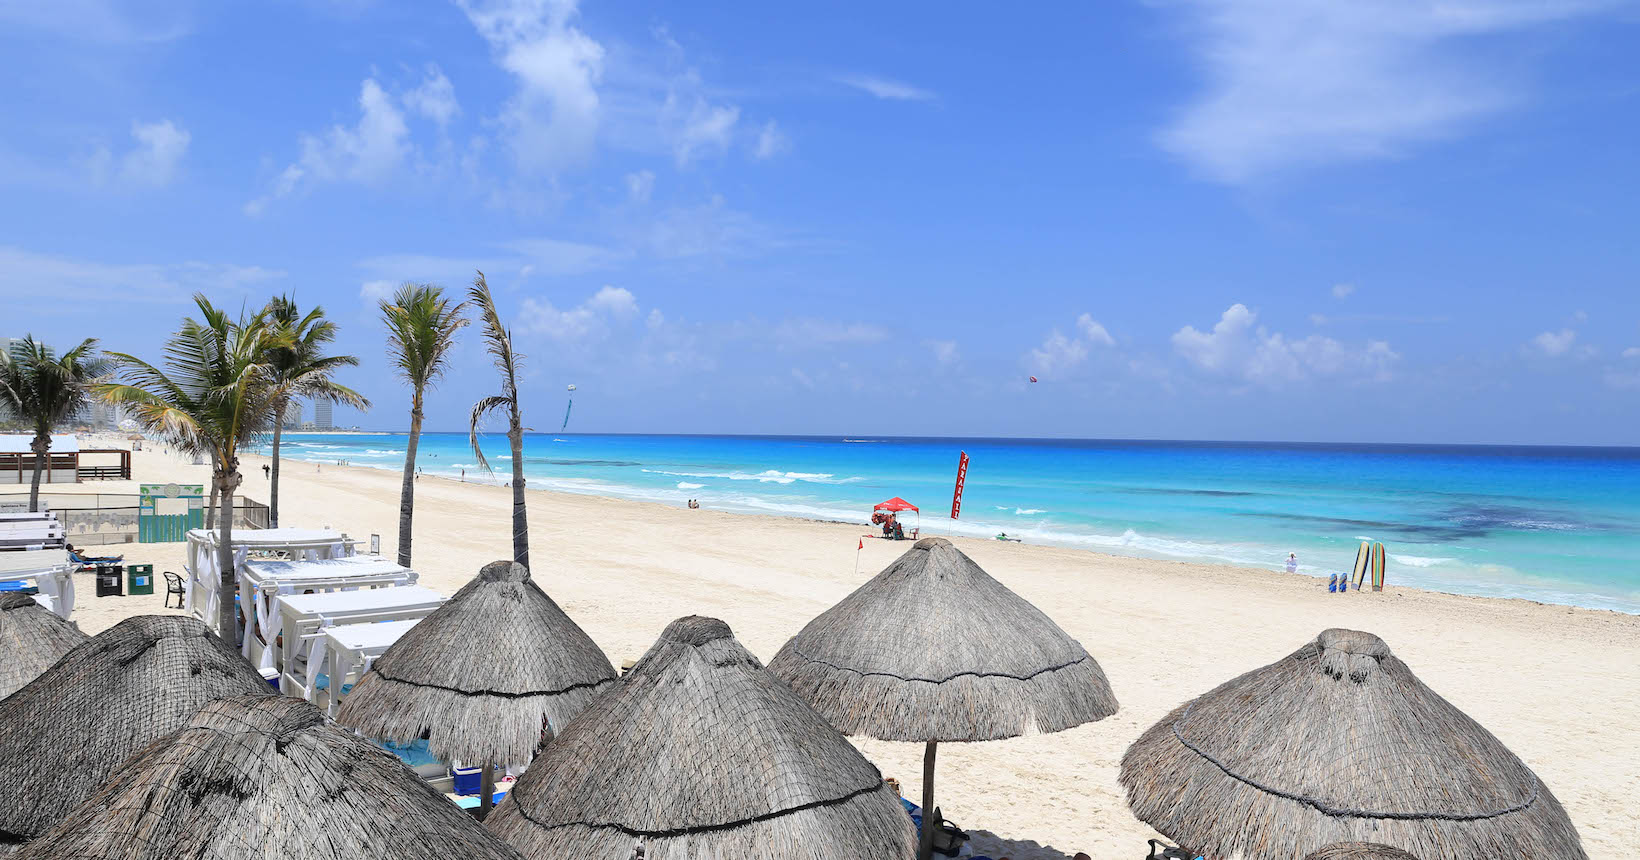 praias em cancun mexico